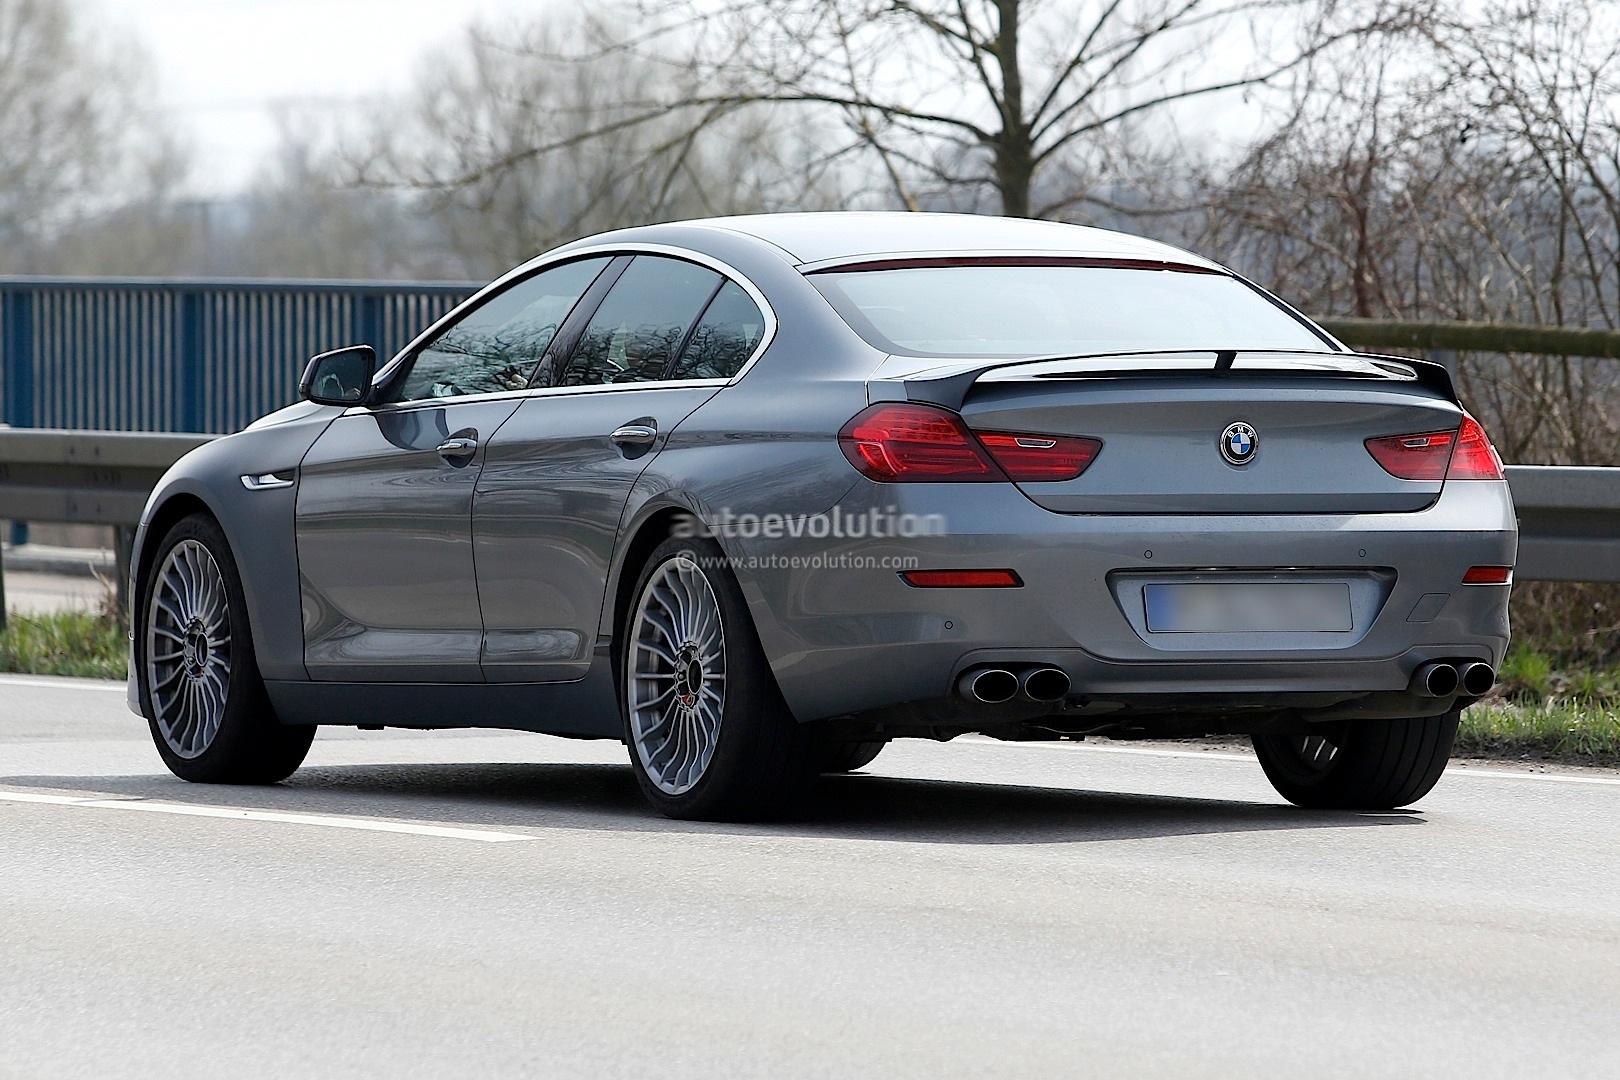 2012 - [BMW] Série 6 / M6 Gran Coupé [F06] - Page 10 Spyshots-alpina-b6-biturbo-gran-coupe_5